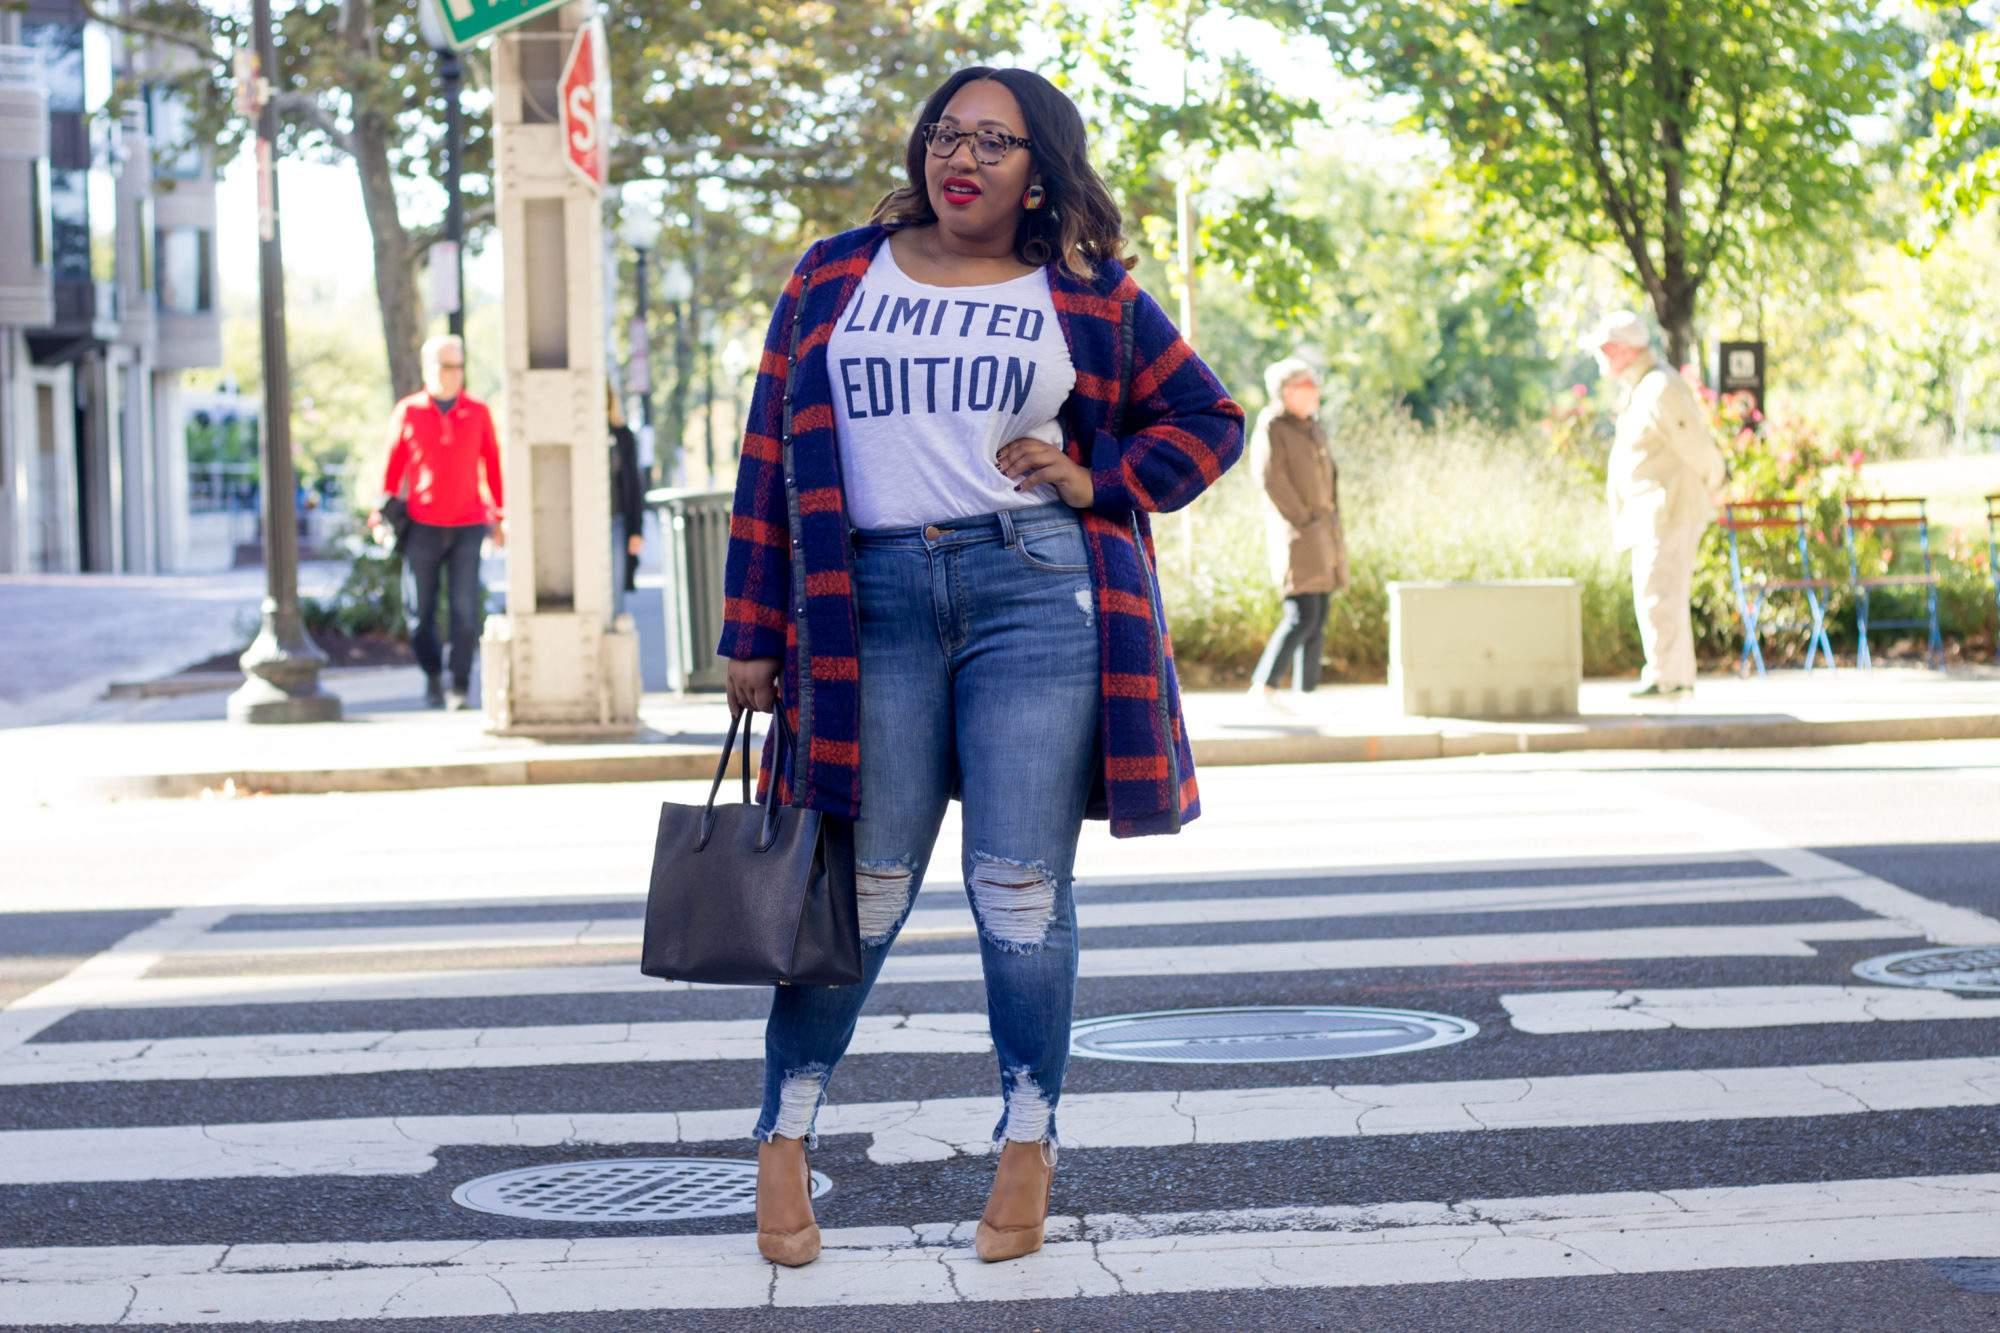 Fashion Blogger Spotlight: Tiffany of Policy and Fashion